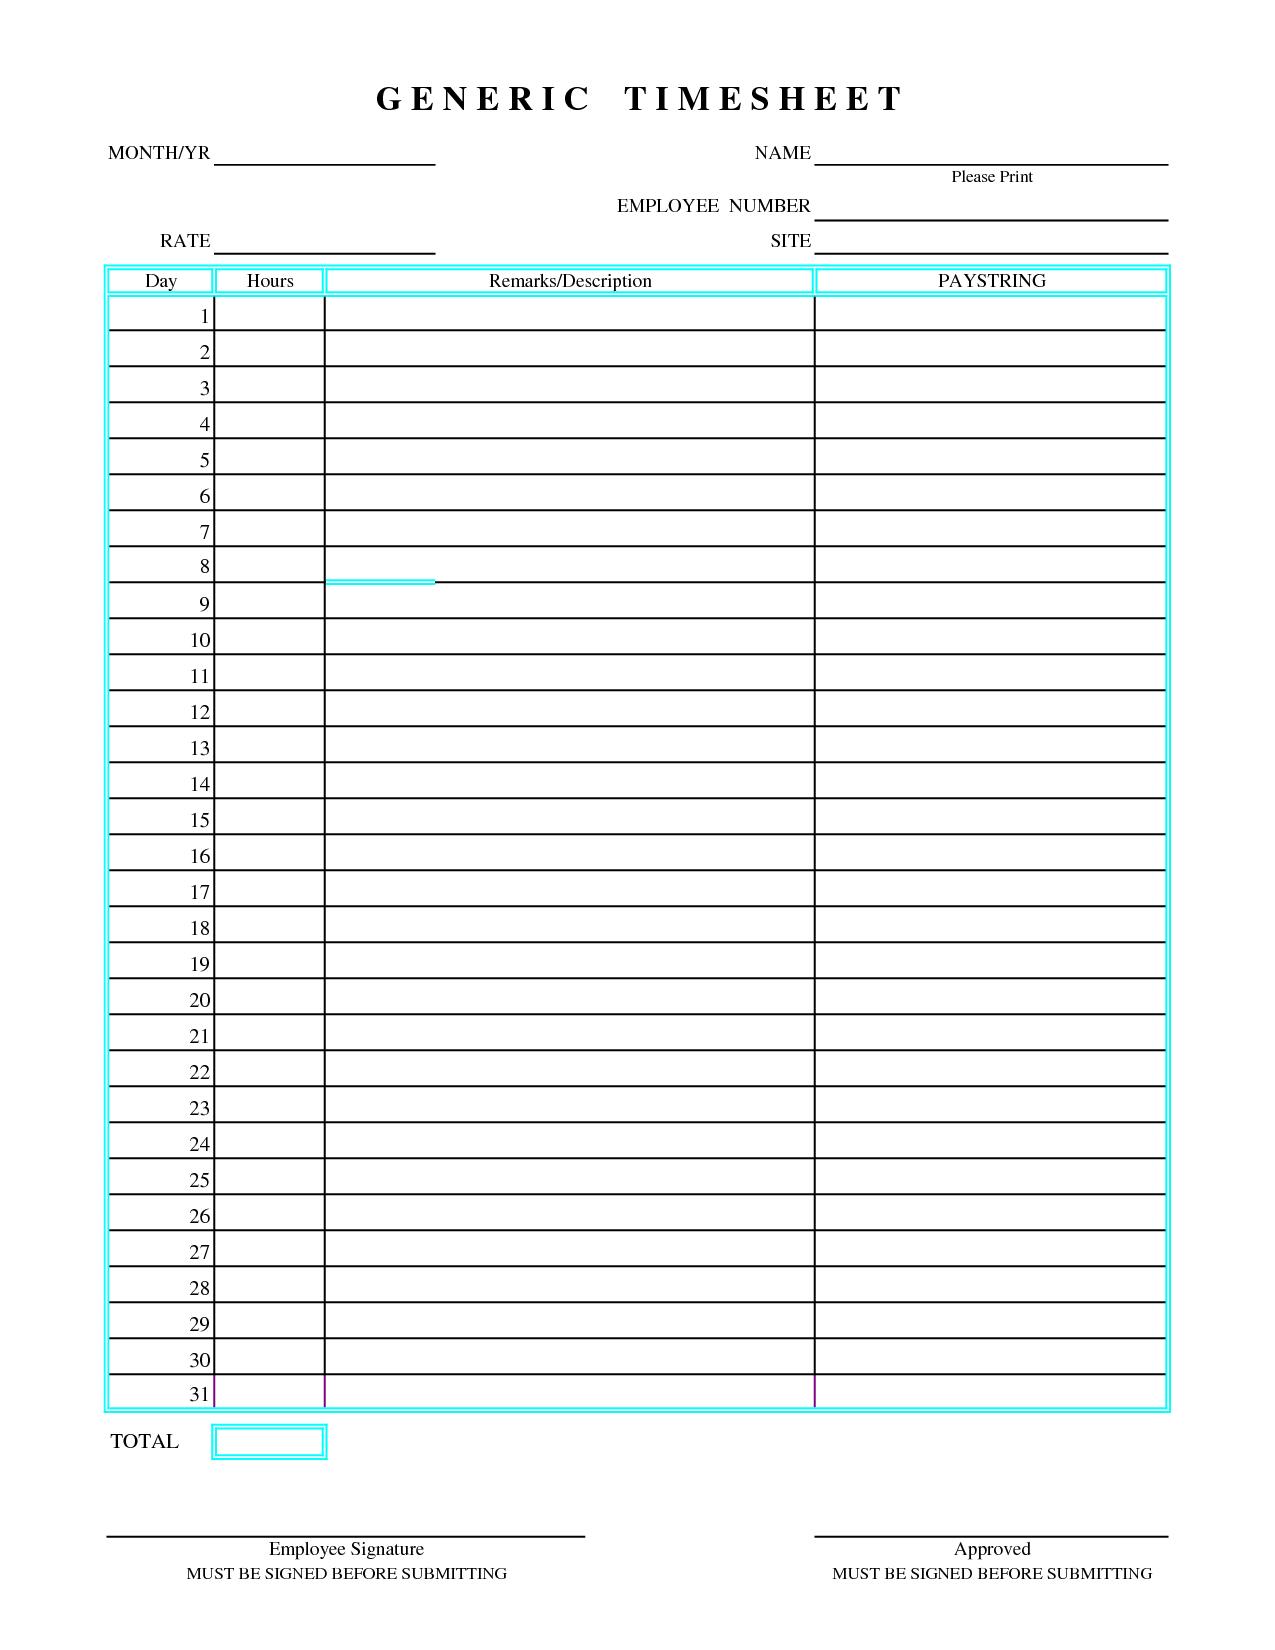 Doc15001030 Time Sheet Printable employee time sheet – Free Printable Proposal Forms